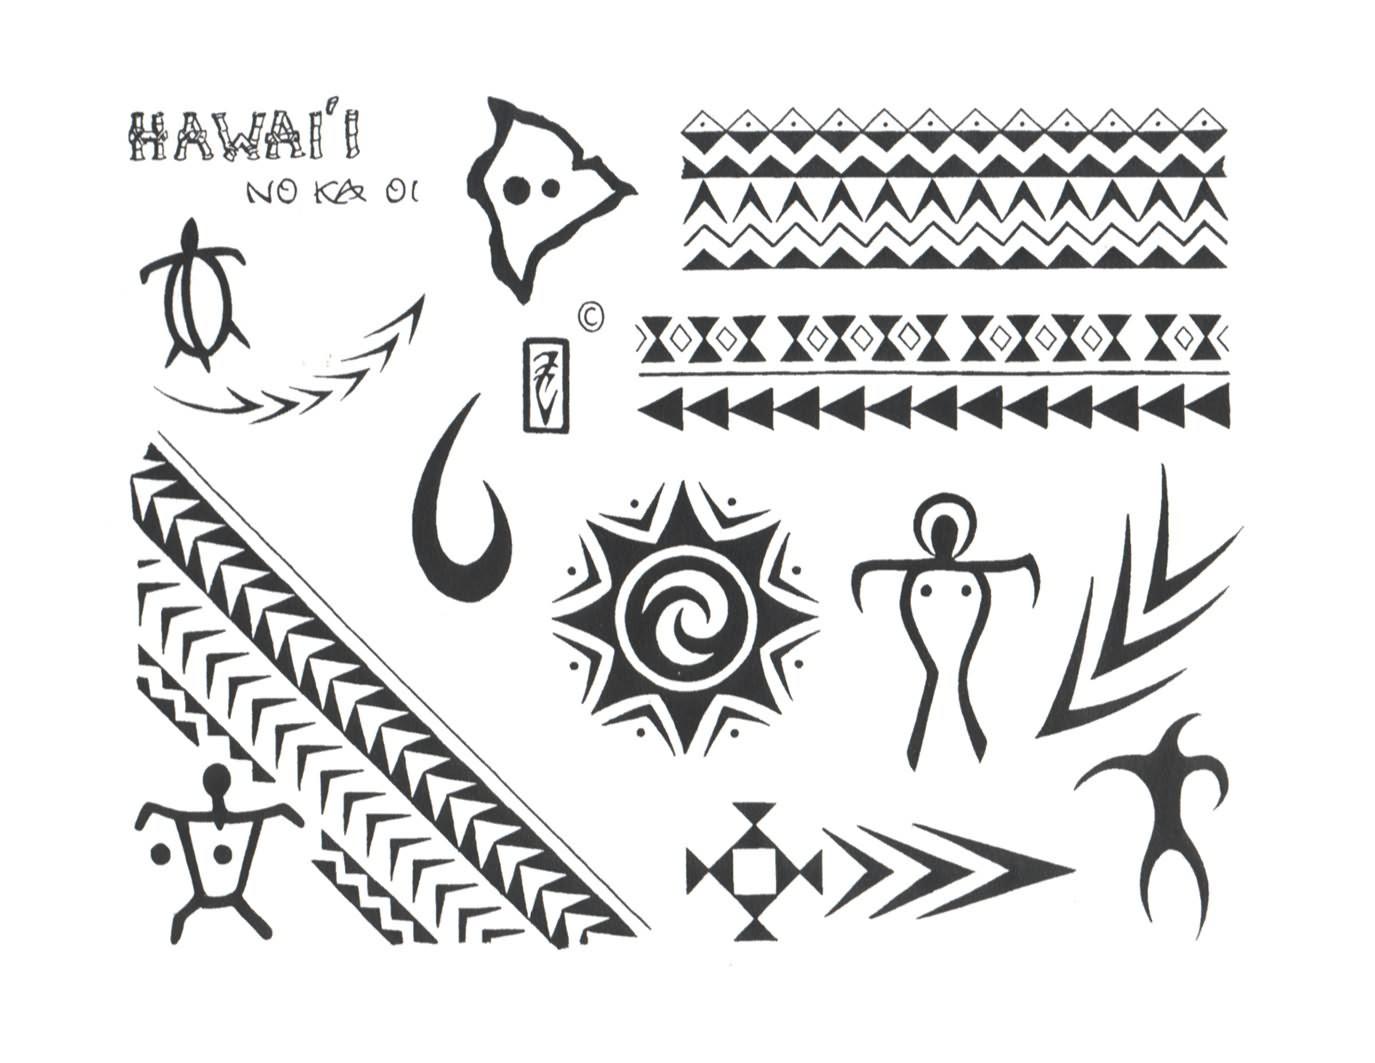 Gres Tatoo Topic Hawaiian Armband Tattoo Design